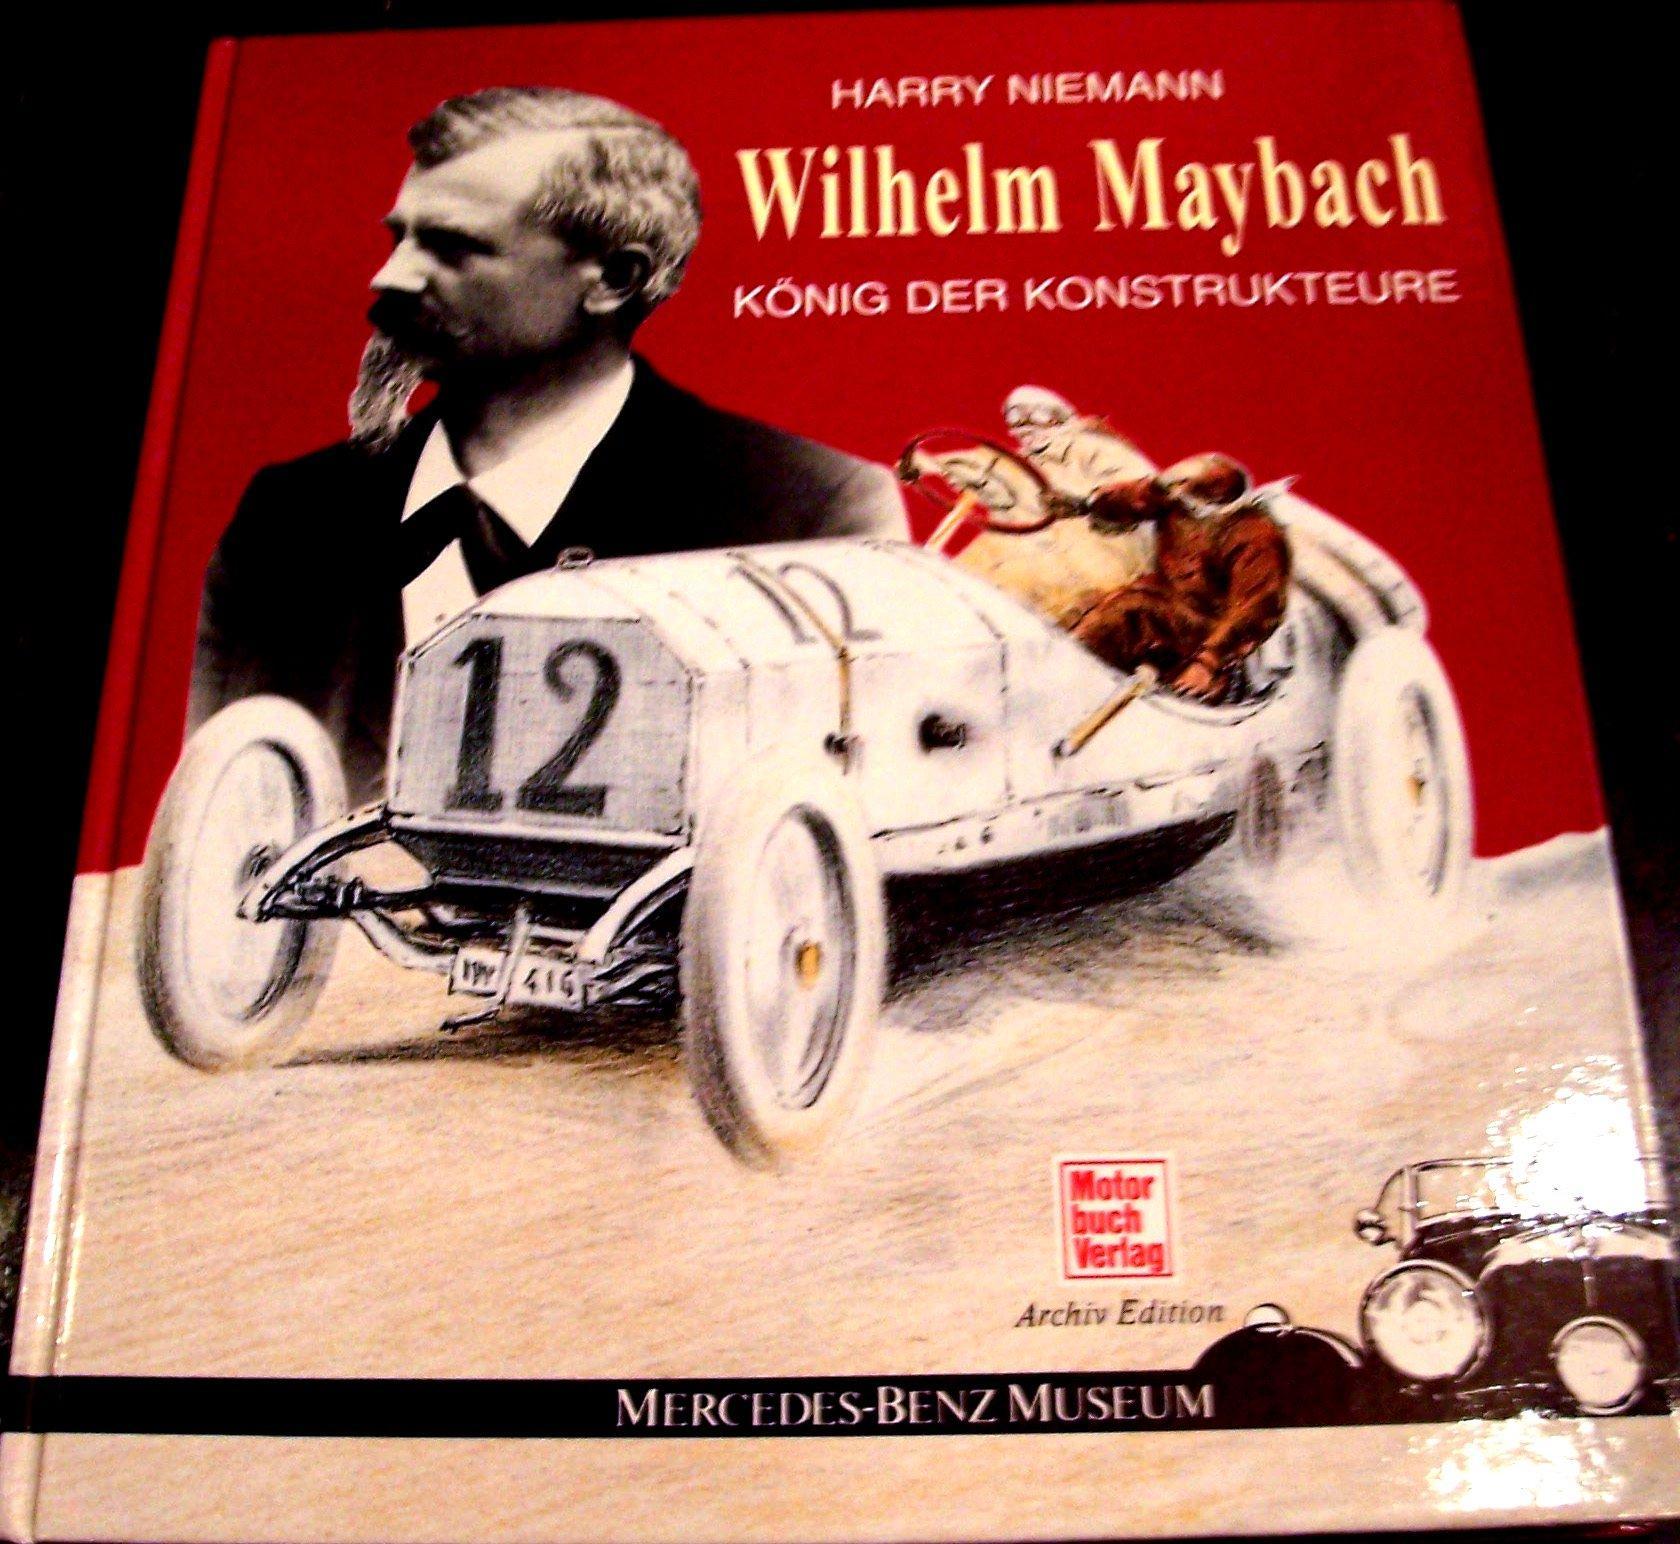 Wilhelm Maybach Koenig der Konstrukteure